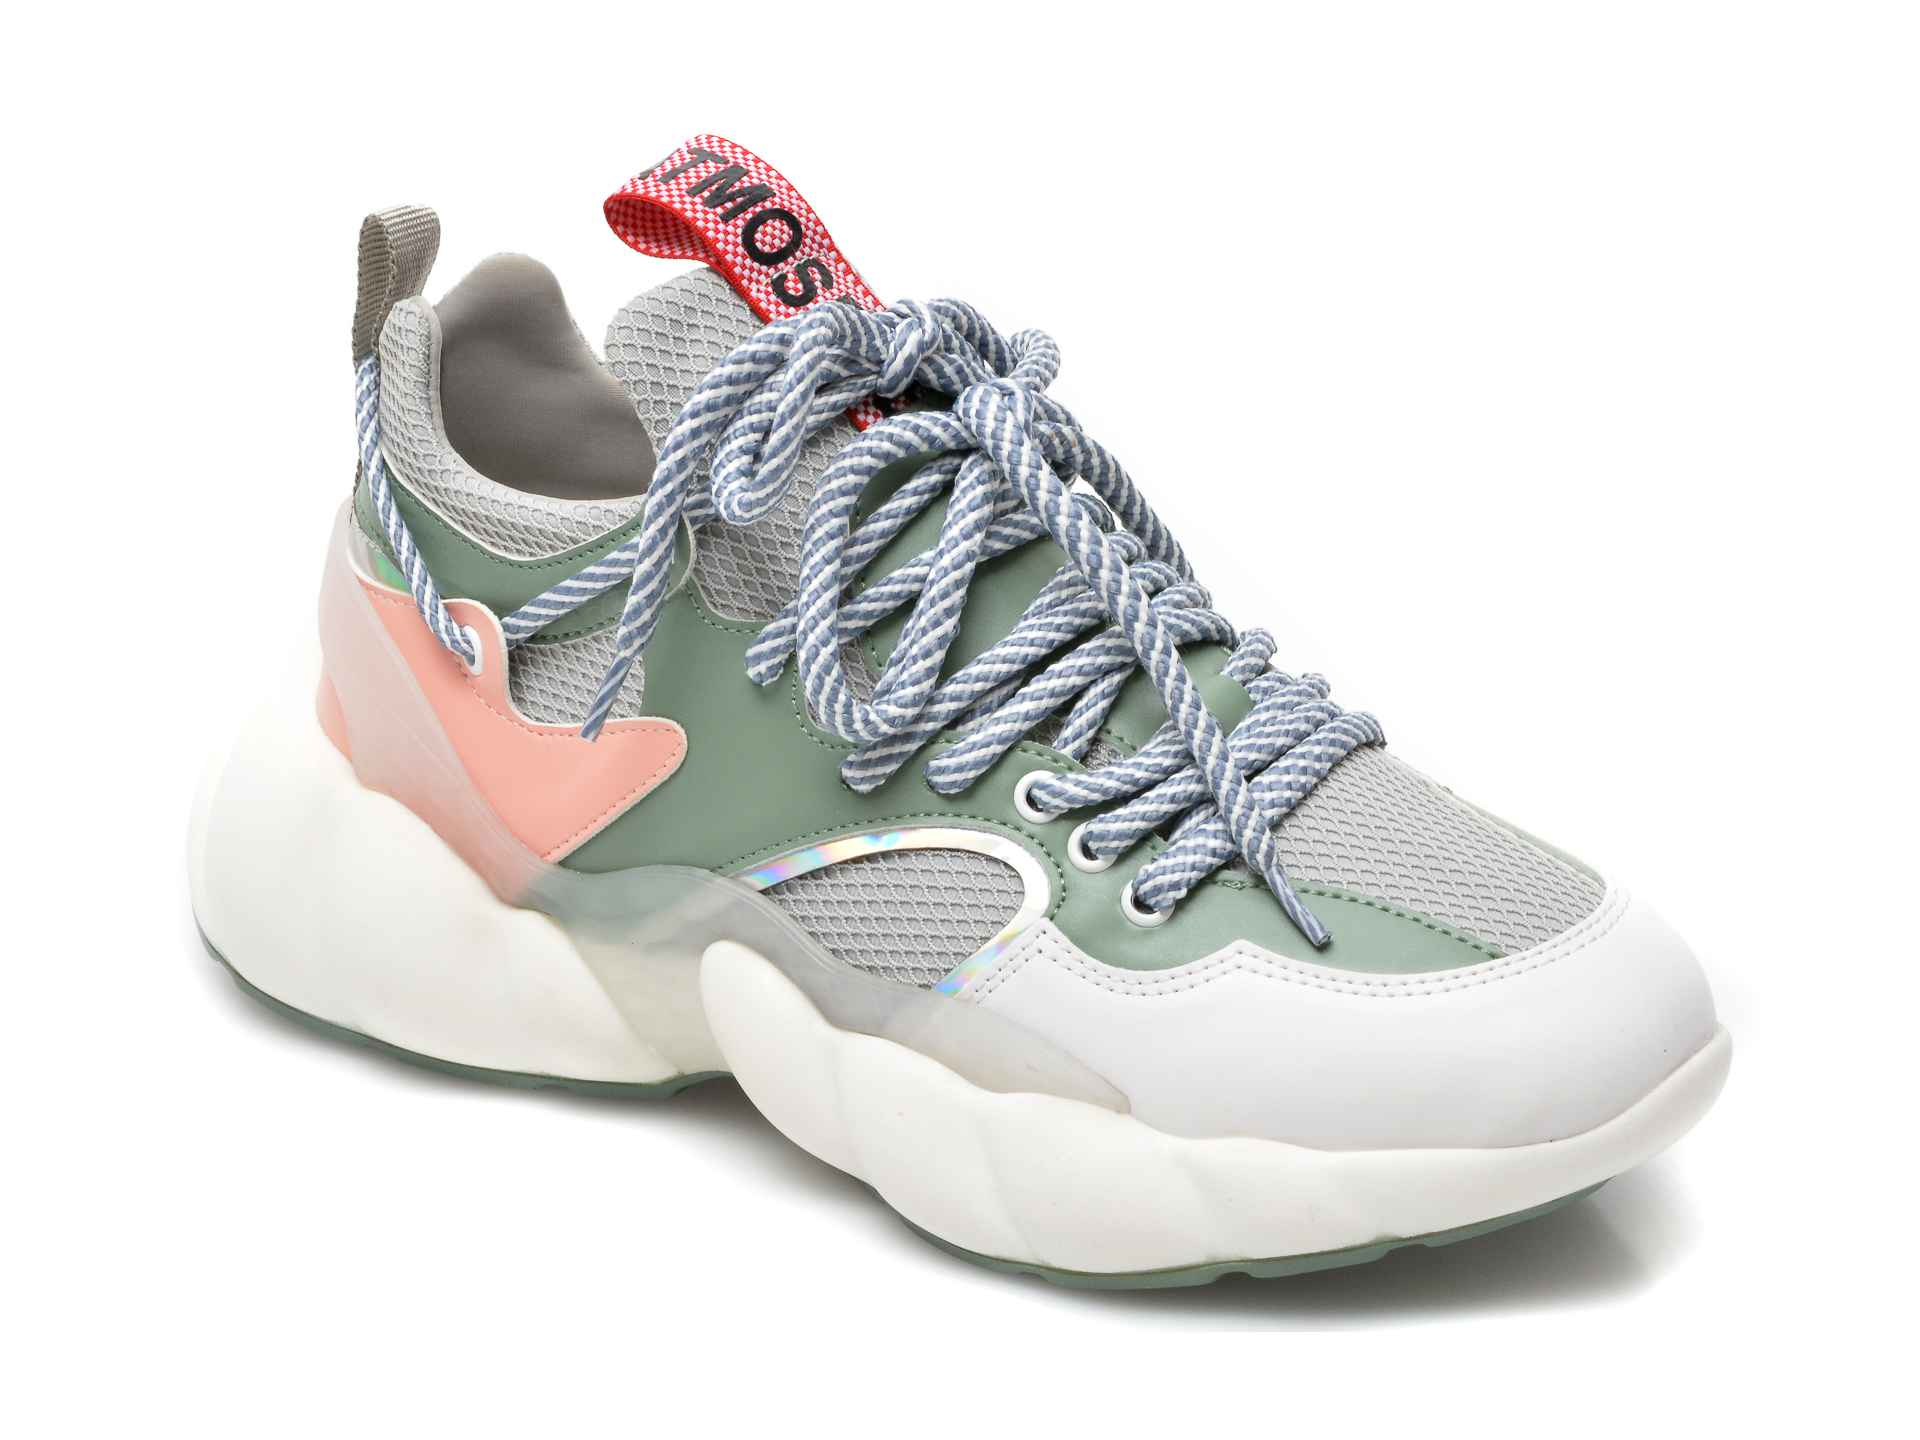 Pantofi sport GRYXX verzi, MO1545, din material textil si piele ecologica imagine otter.ro 2021